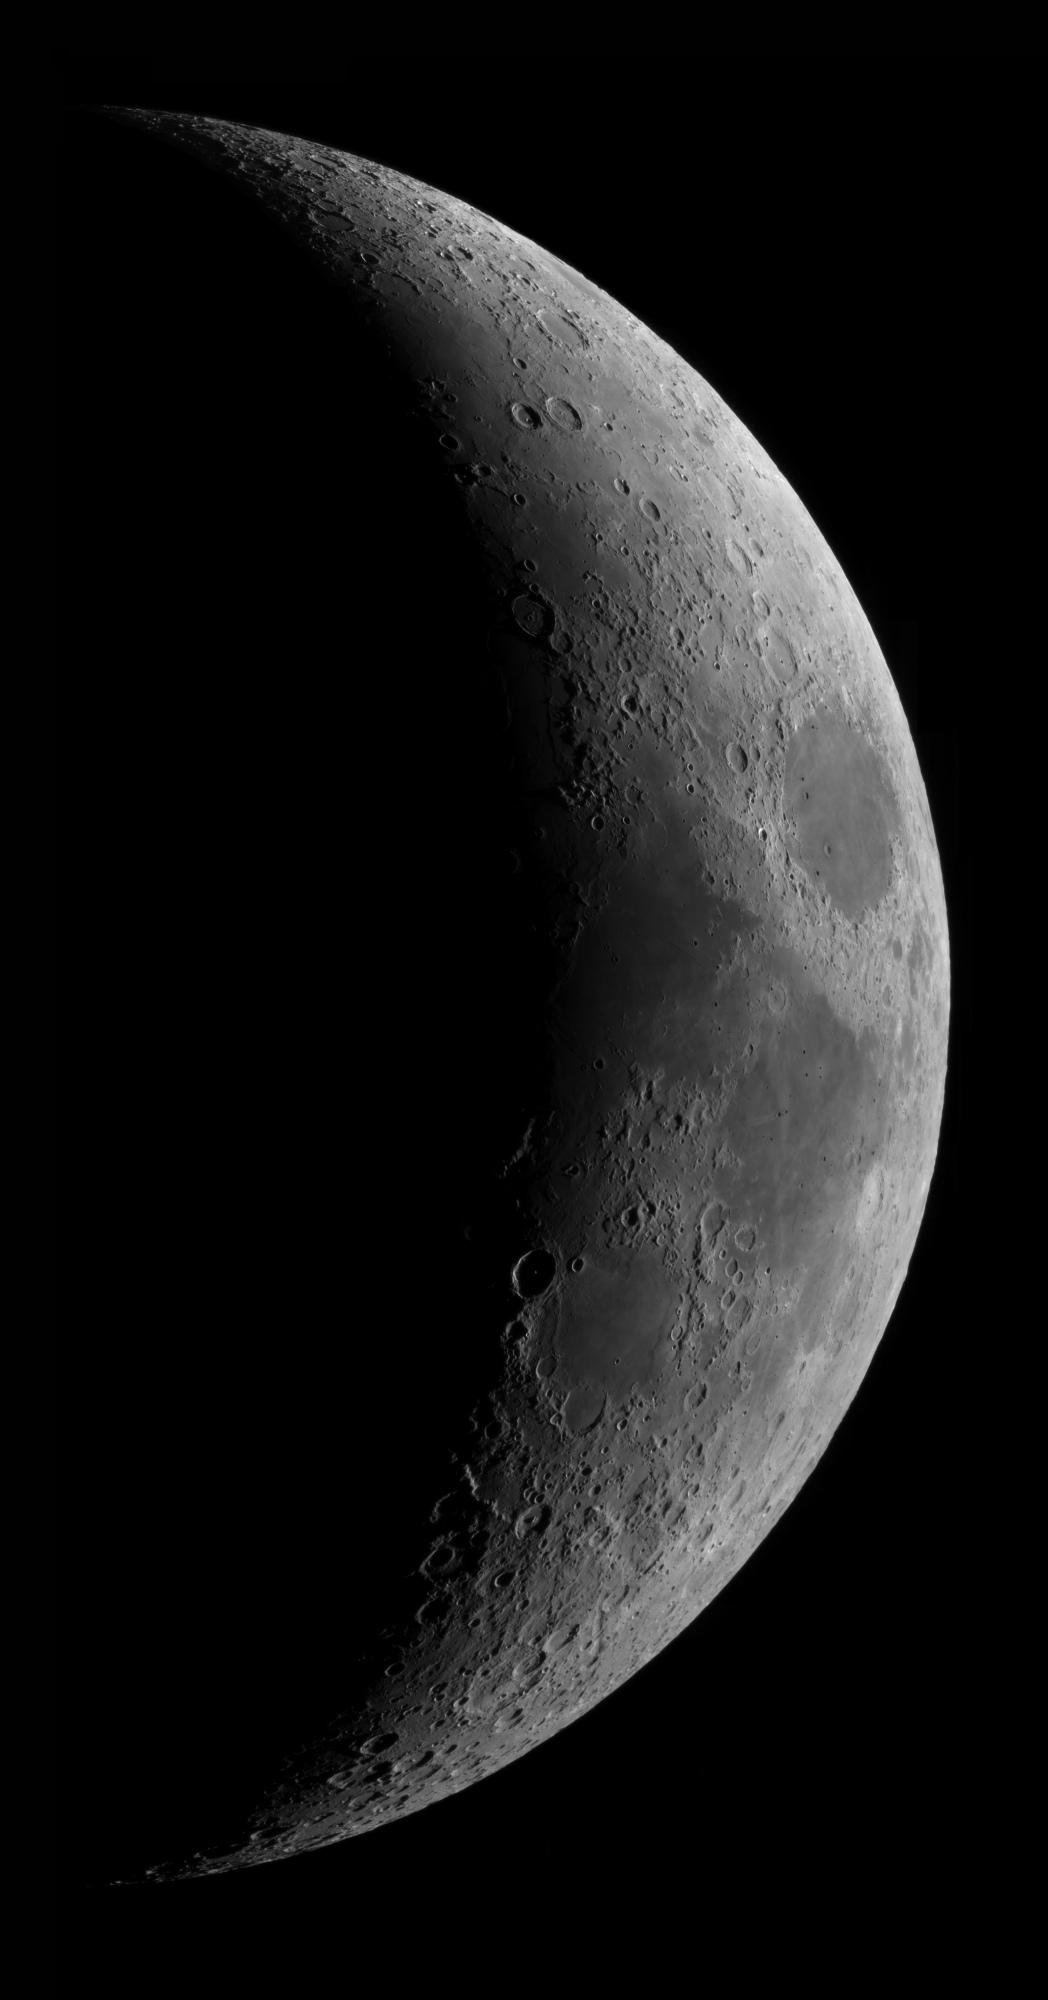 5c8a68bbd59b5_lune110319(50).thumb.jpg.863dcac156a859339010f37c329dc9a3.jpg